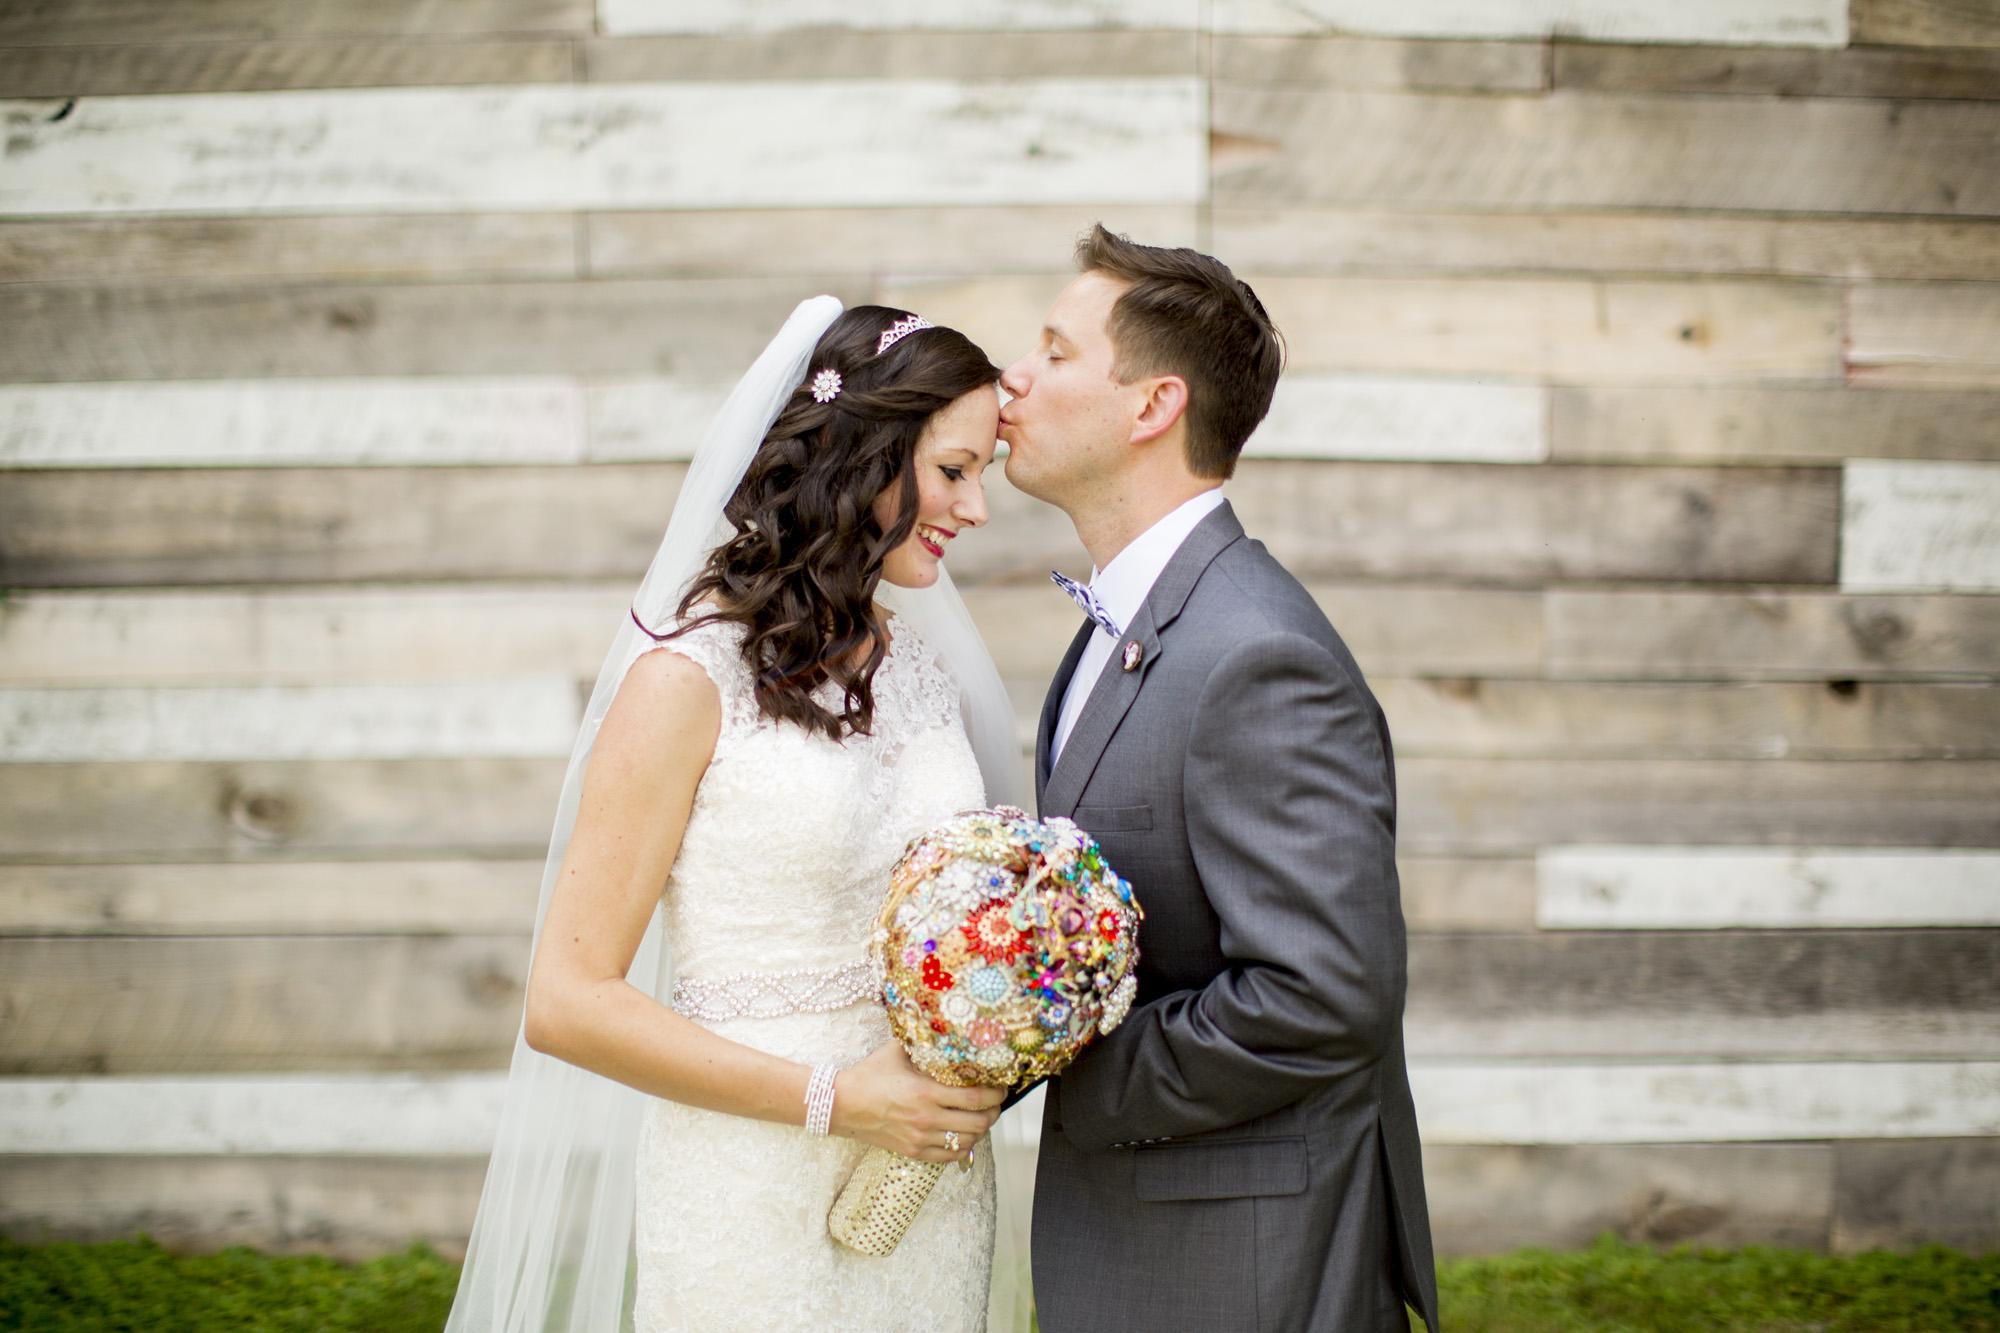 Seriously_Sabrina_Photography_Bowling_Green_Kentucky_Highland_Stables_Wedding_Wolff50.jpg